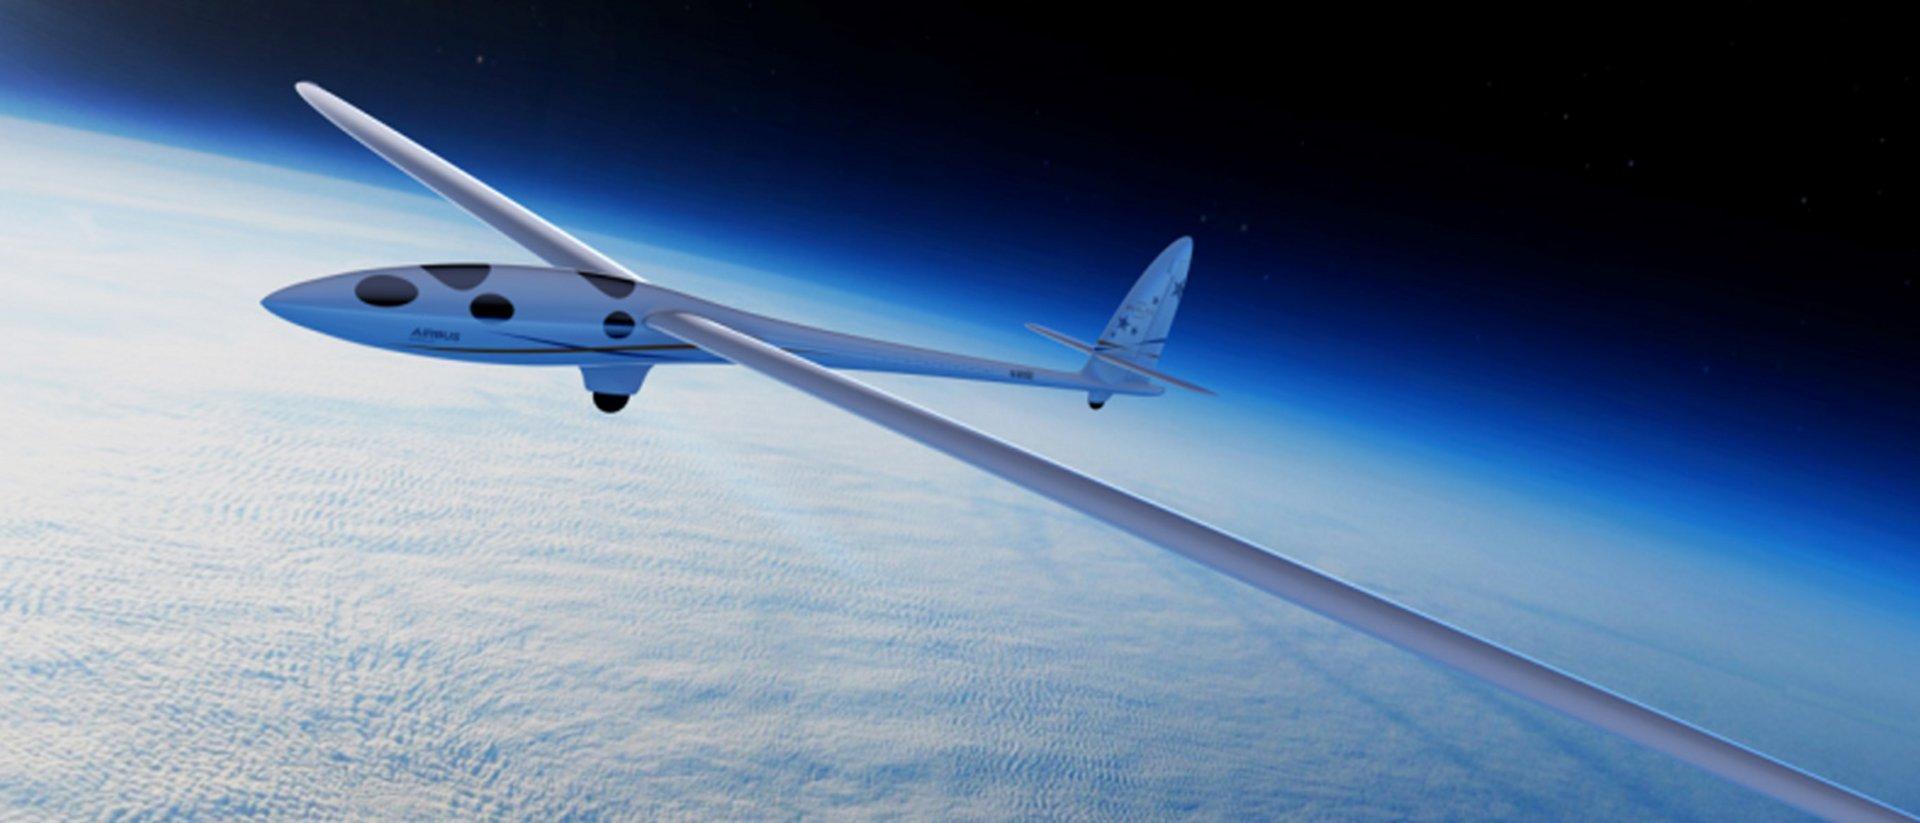 The Perlan 2 glider